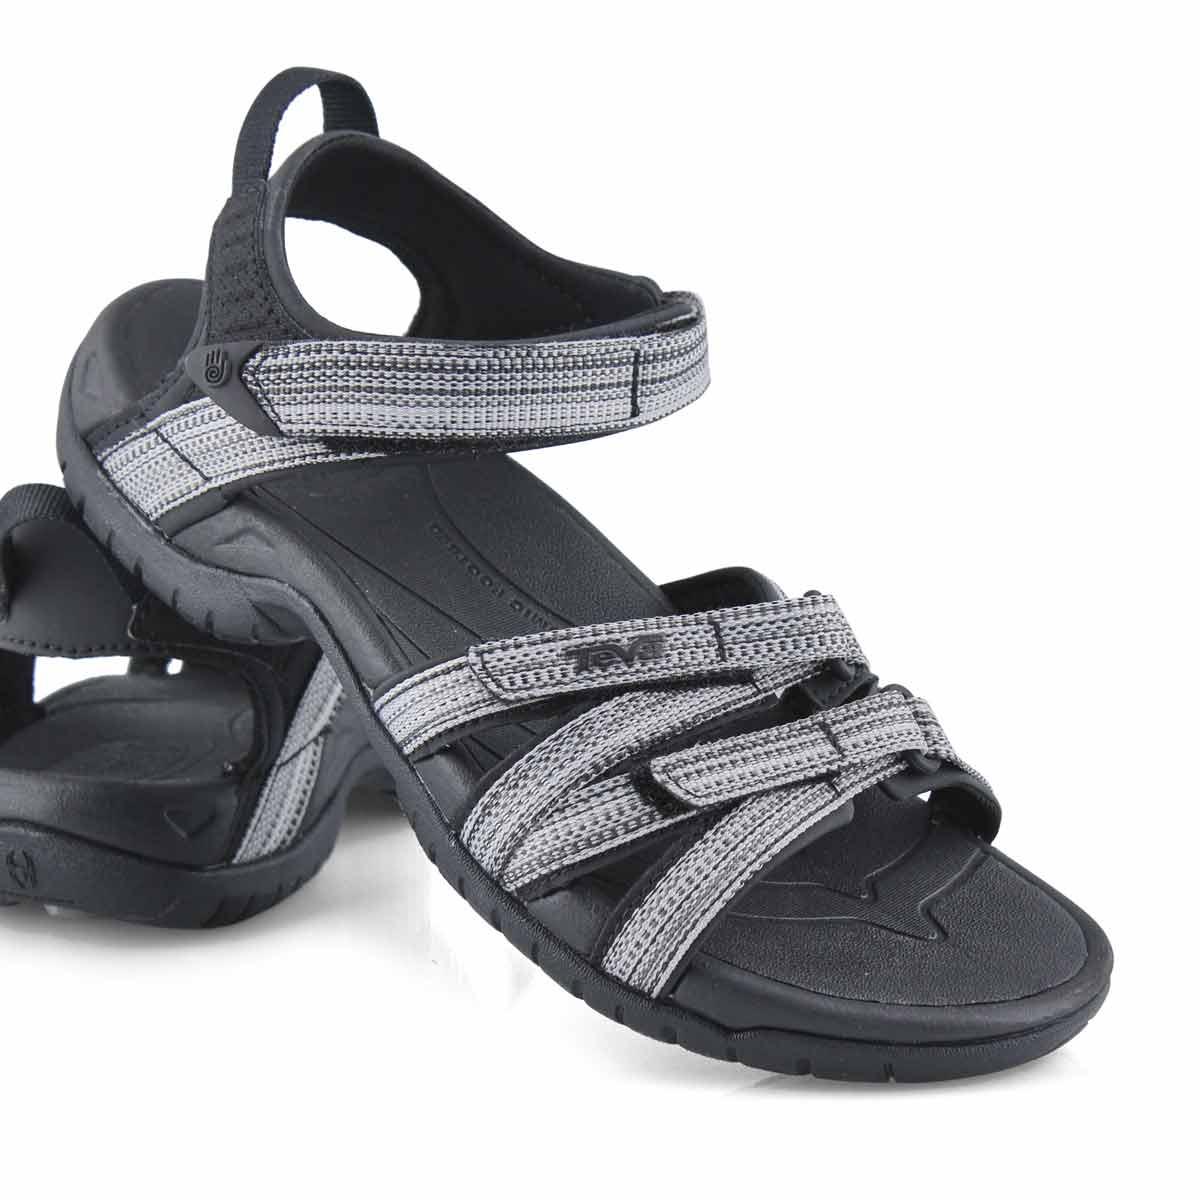 Sandale sport Tirra, noir/blanc, fem